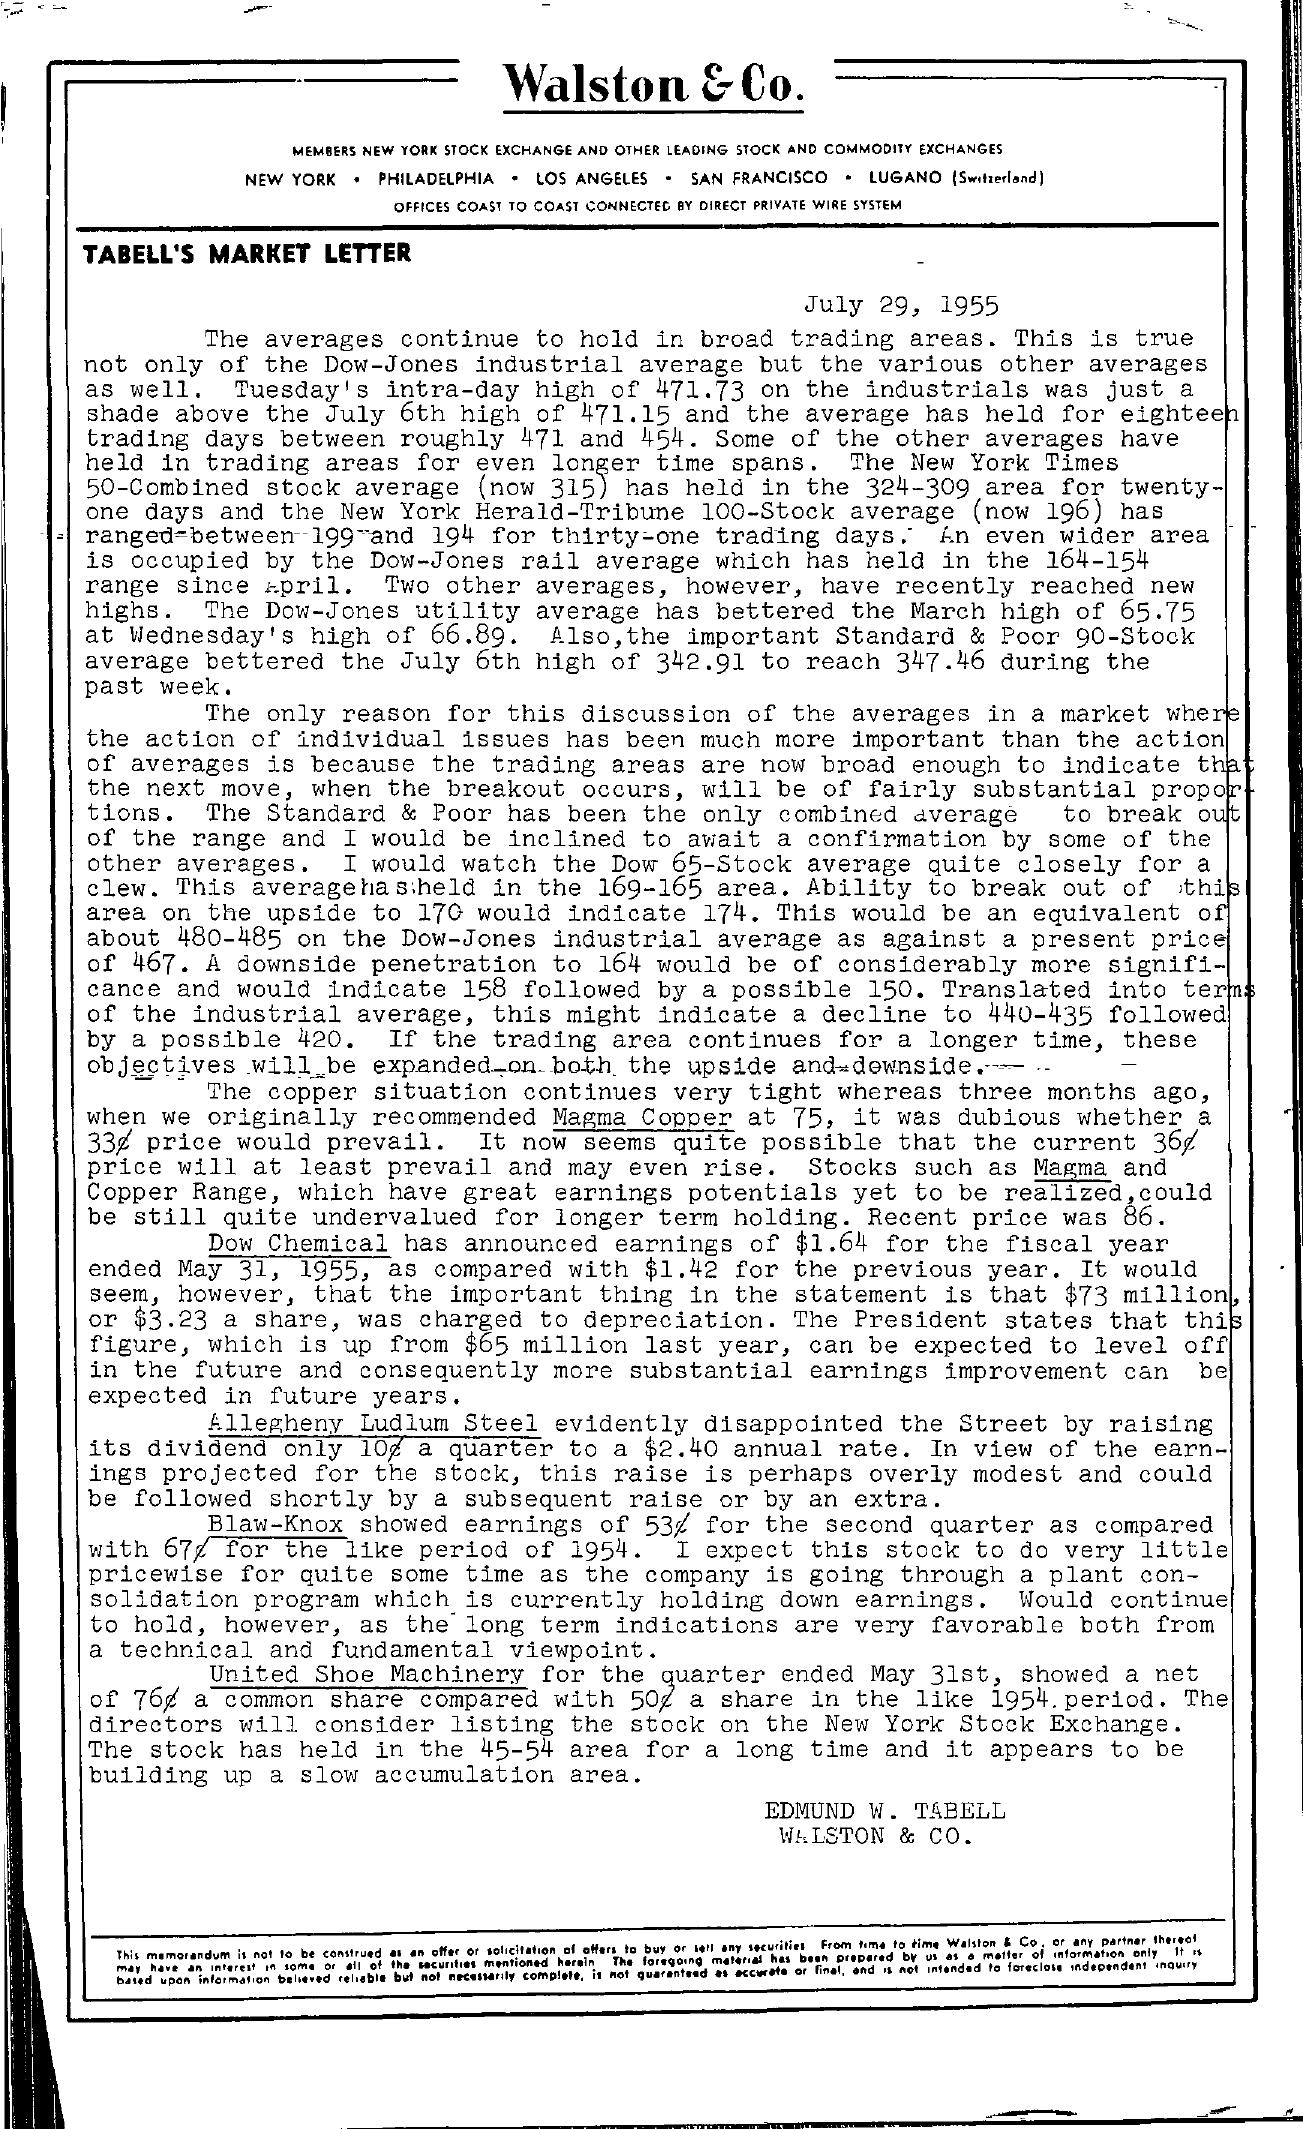 Tabell's Market Letter - July 29, 1955